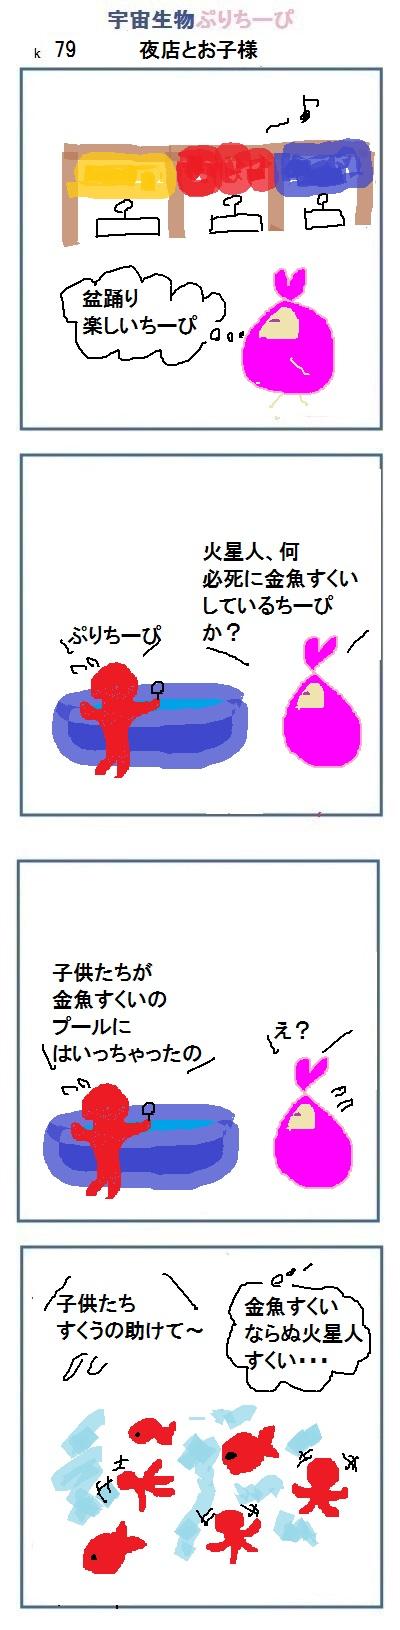 160823_k79.jpg